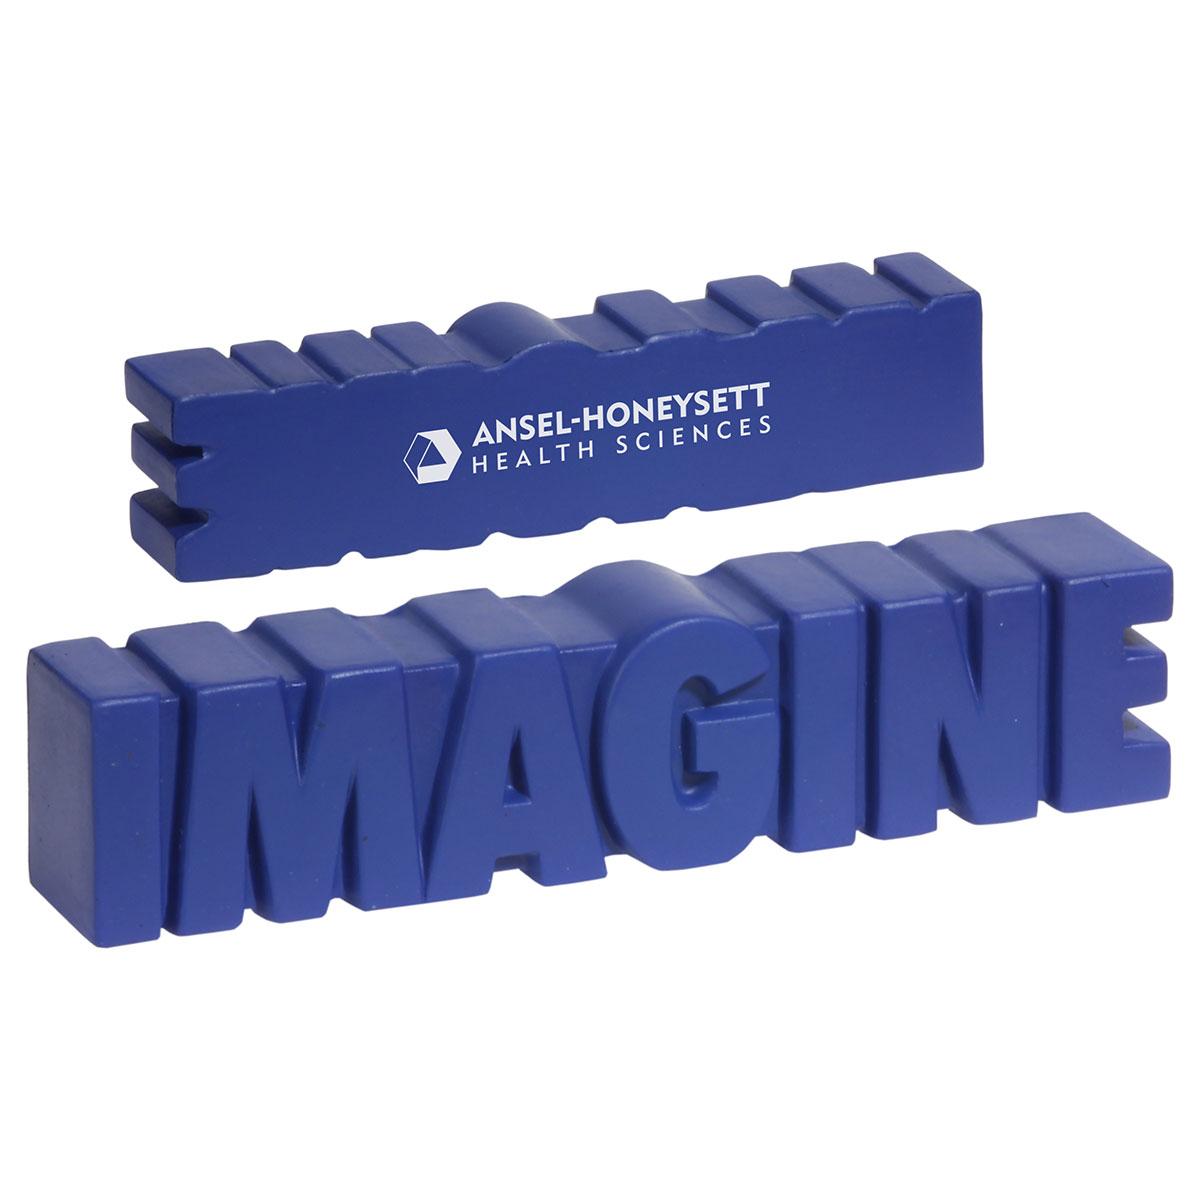 Imagine Word Stress Reliever, LGS-IM13, 1 Colour Imprint